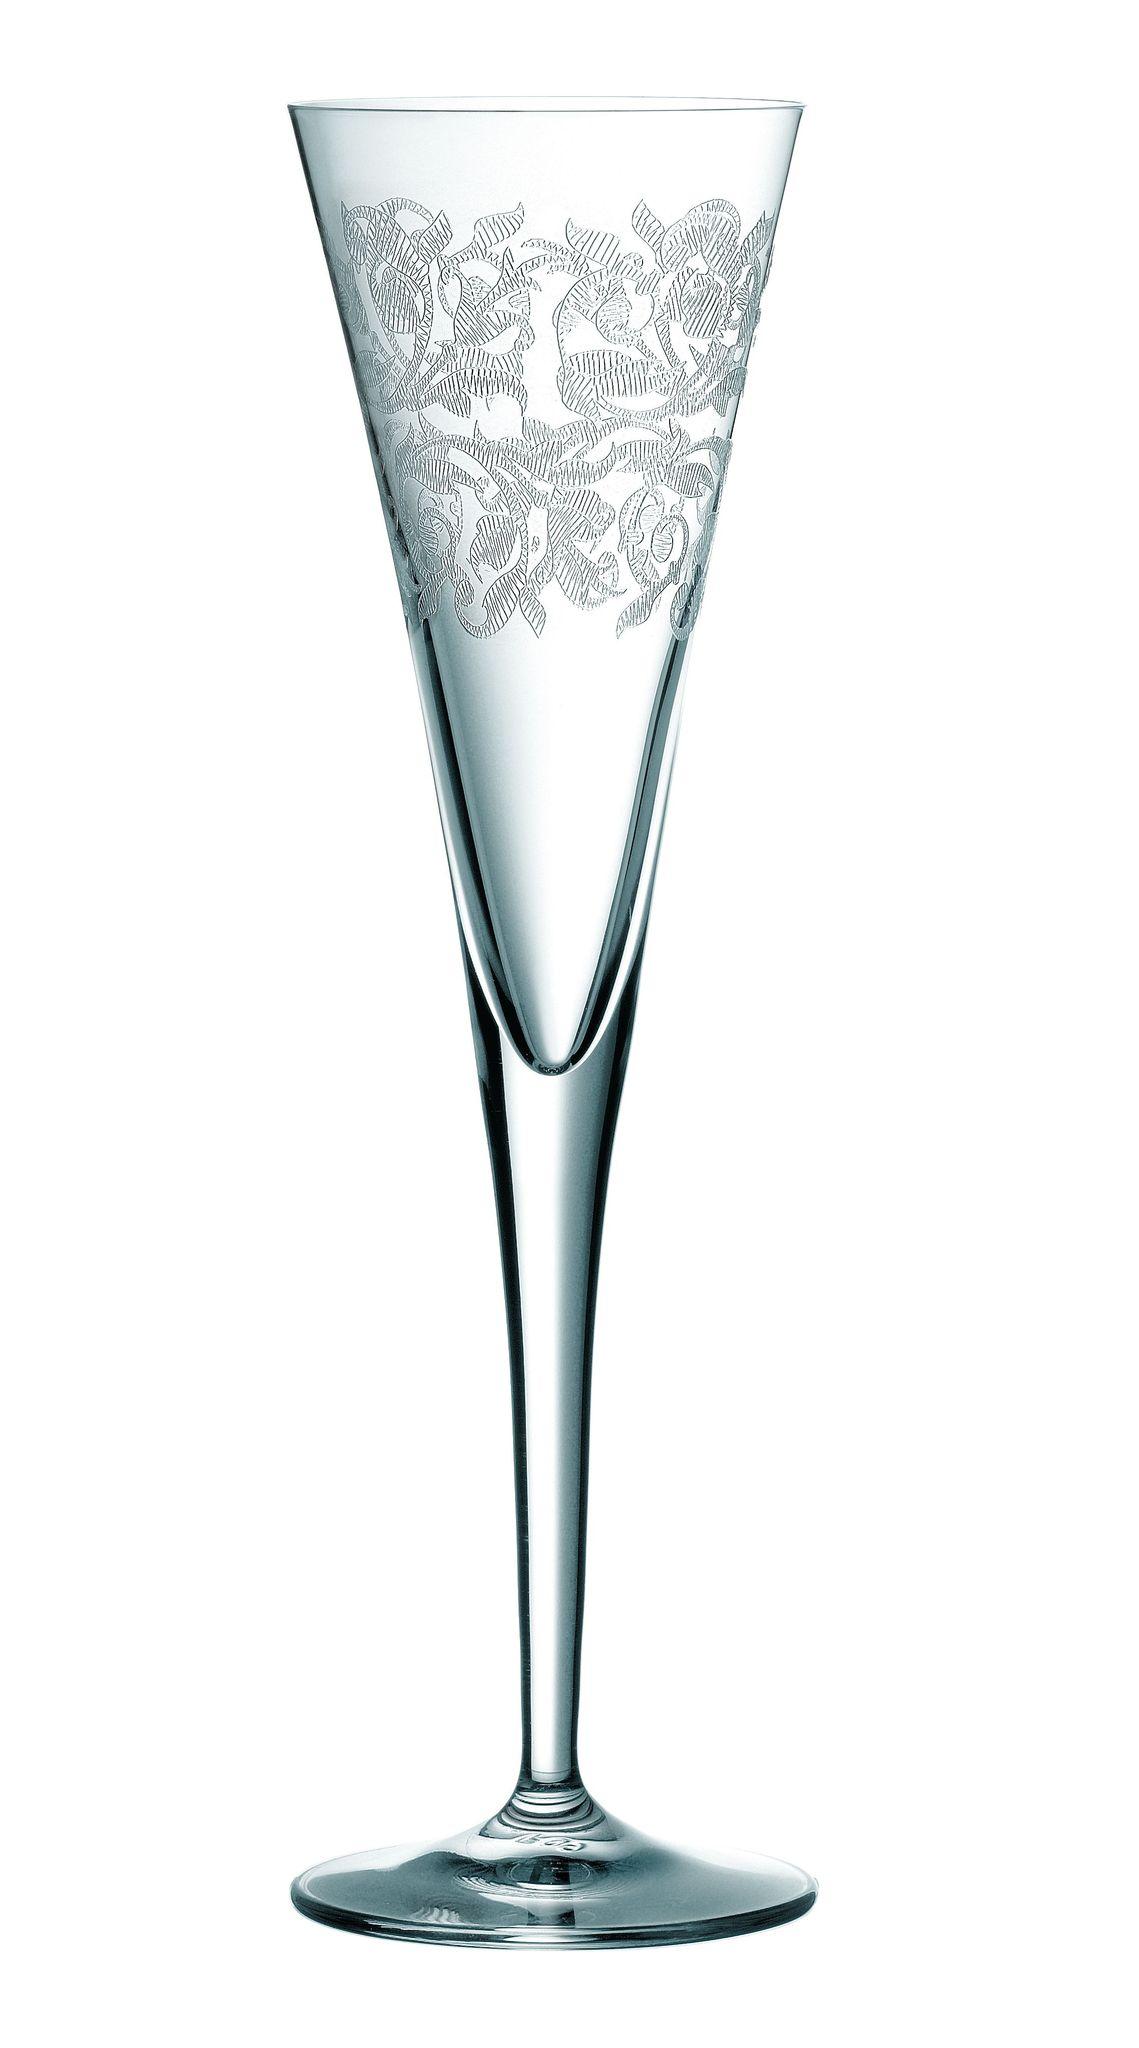 Бокалы Бокал для шампанского 165мл Nachtmann Delight Design 4 bokal-dlya-shampanskogo-165ml-nachtmann-delight-design-4-germaniya.jpg